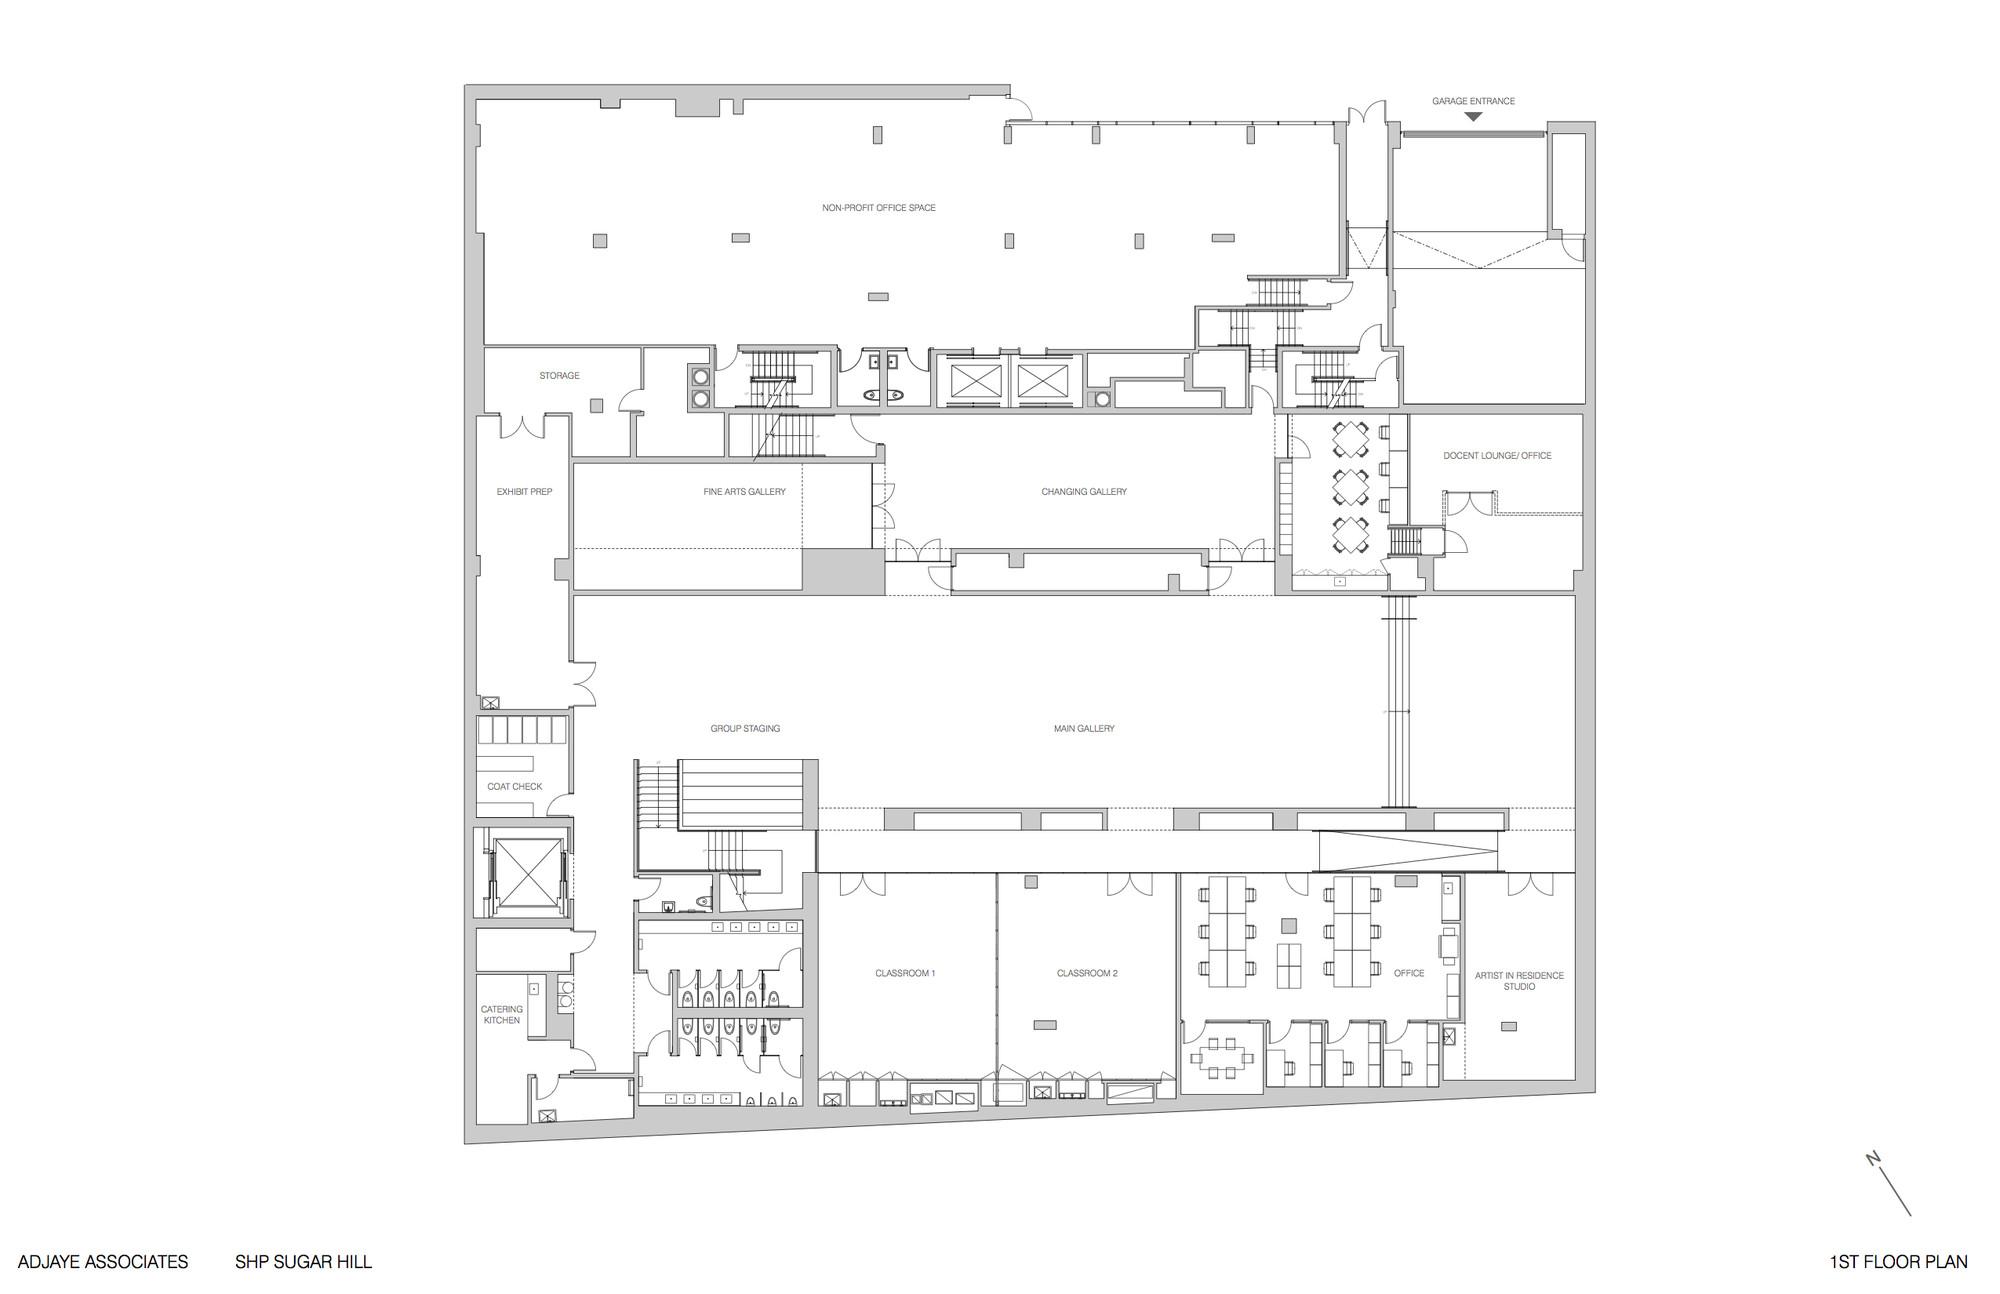 Gallery of David Adjaye\'s Sugar Hill Development: A New Typology for ...